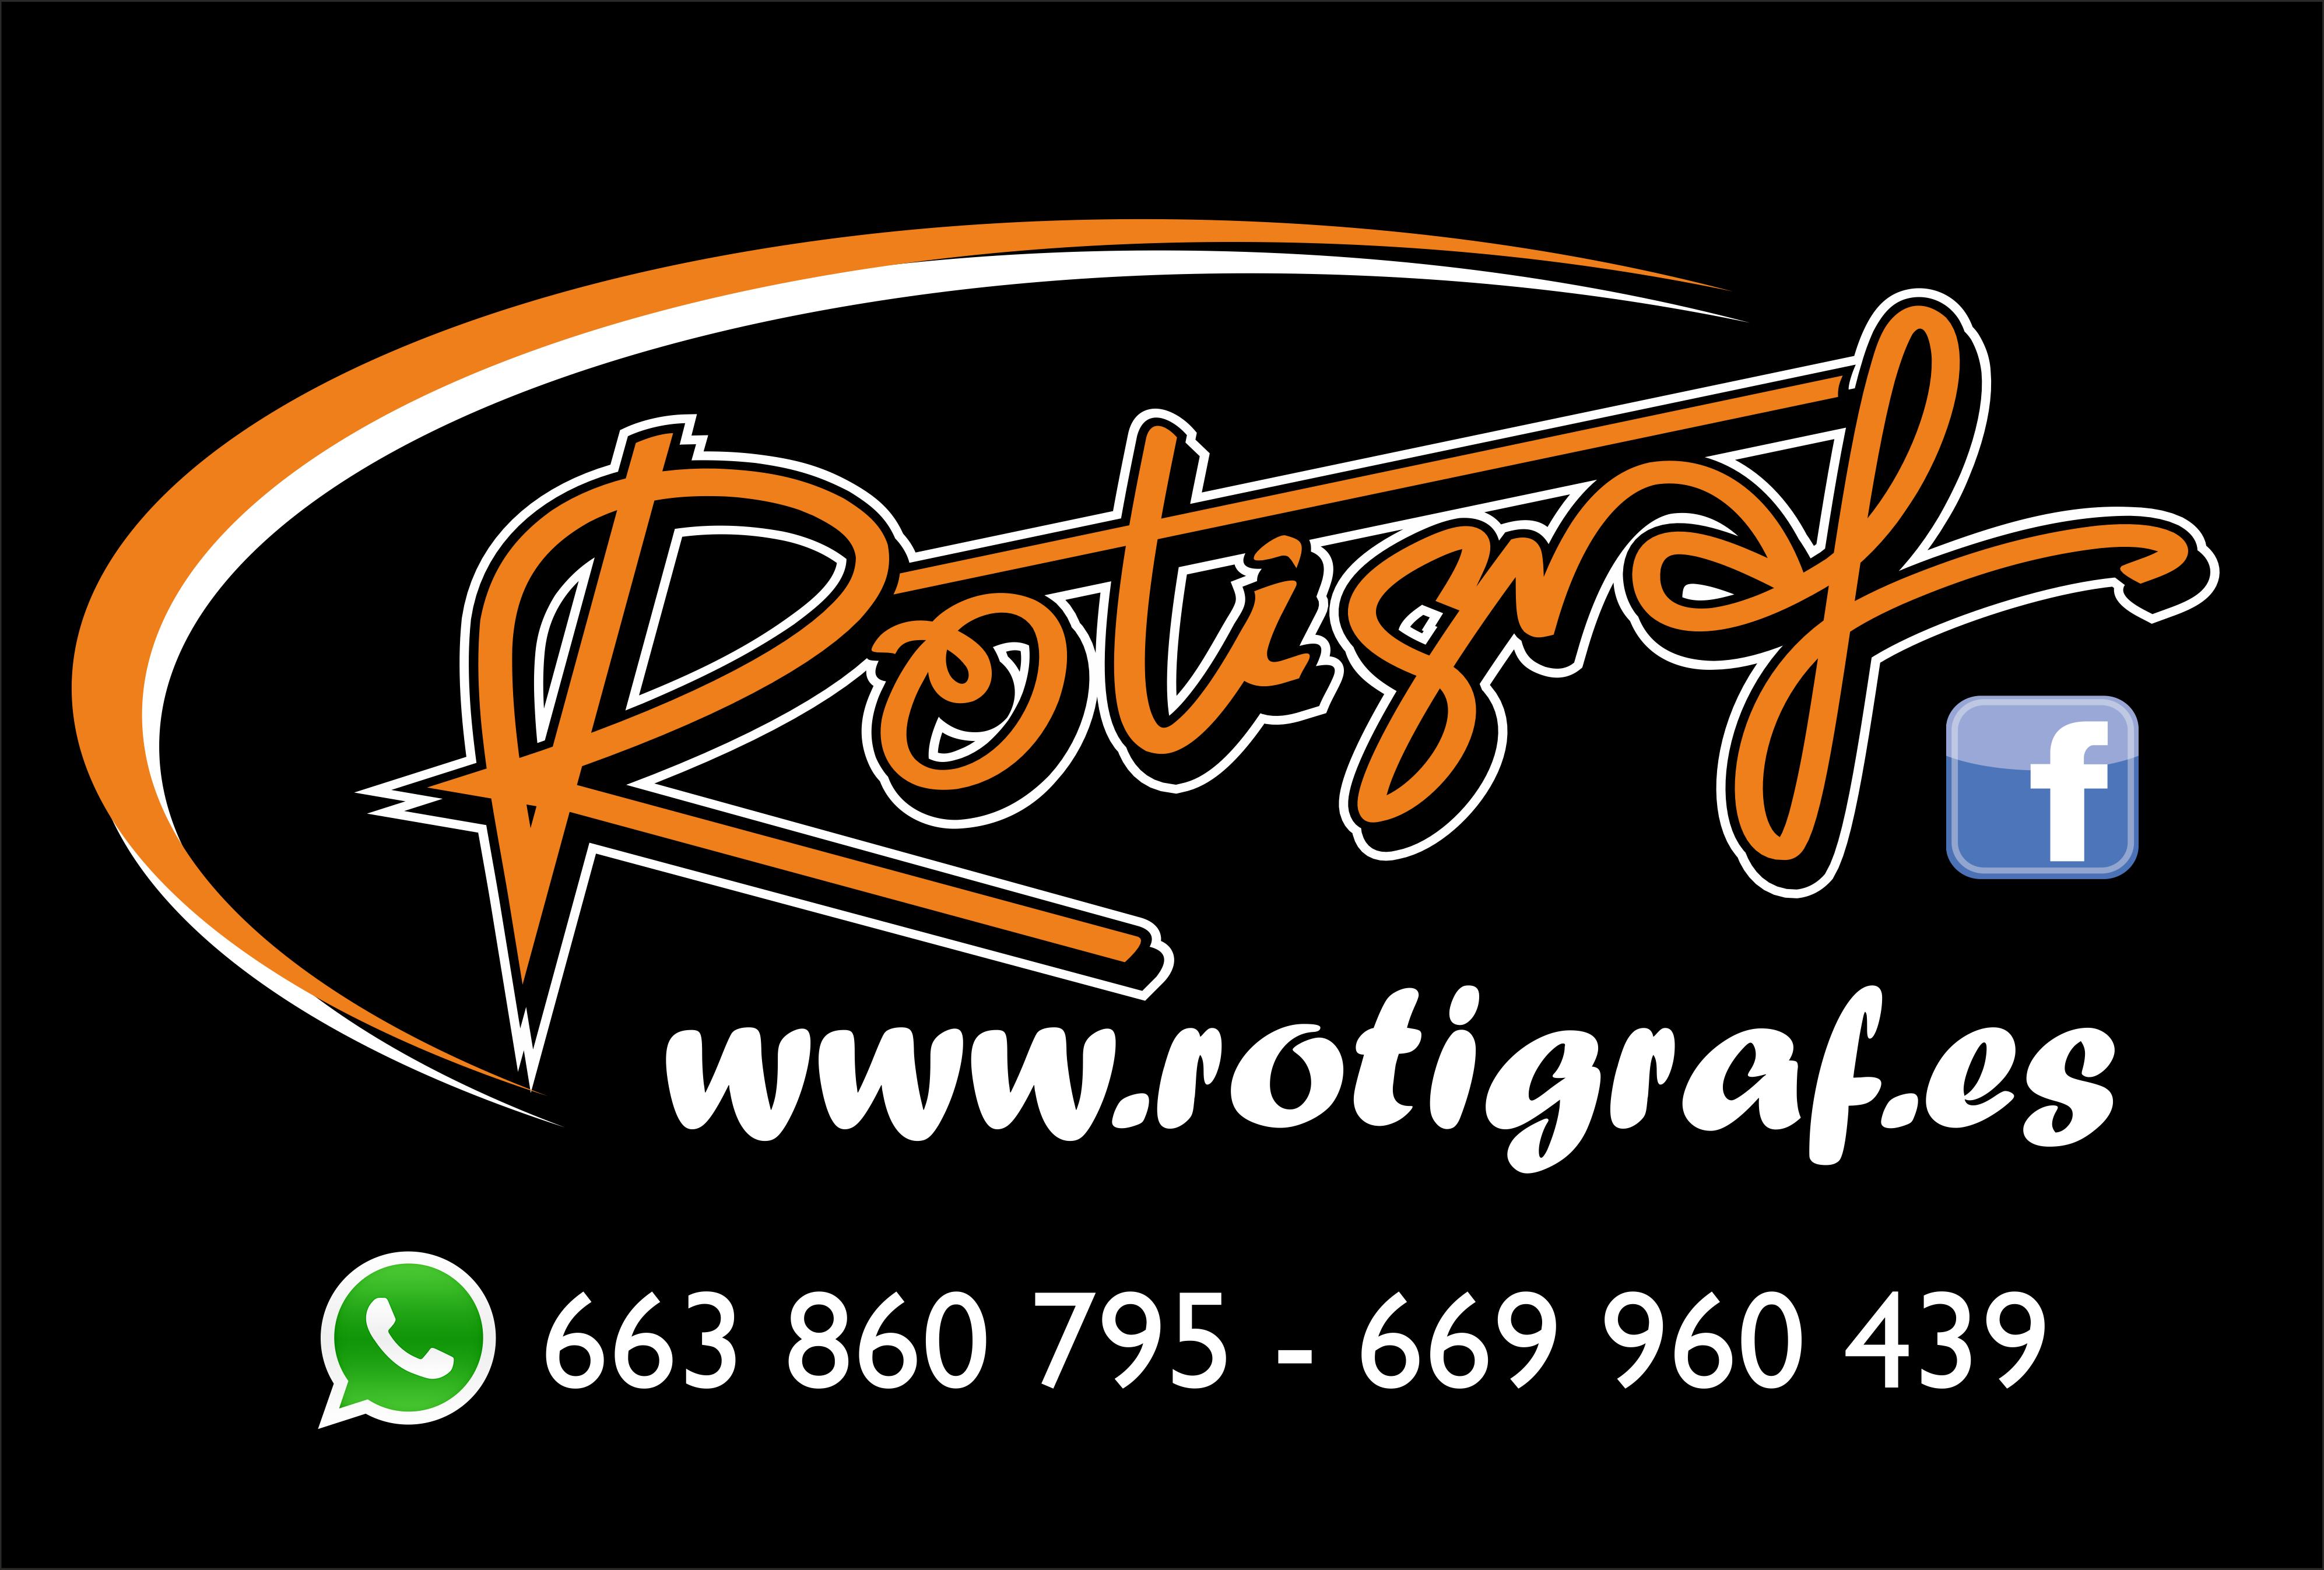 Rotigraf